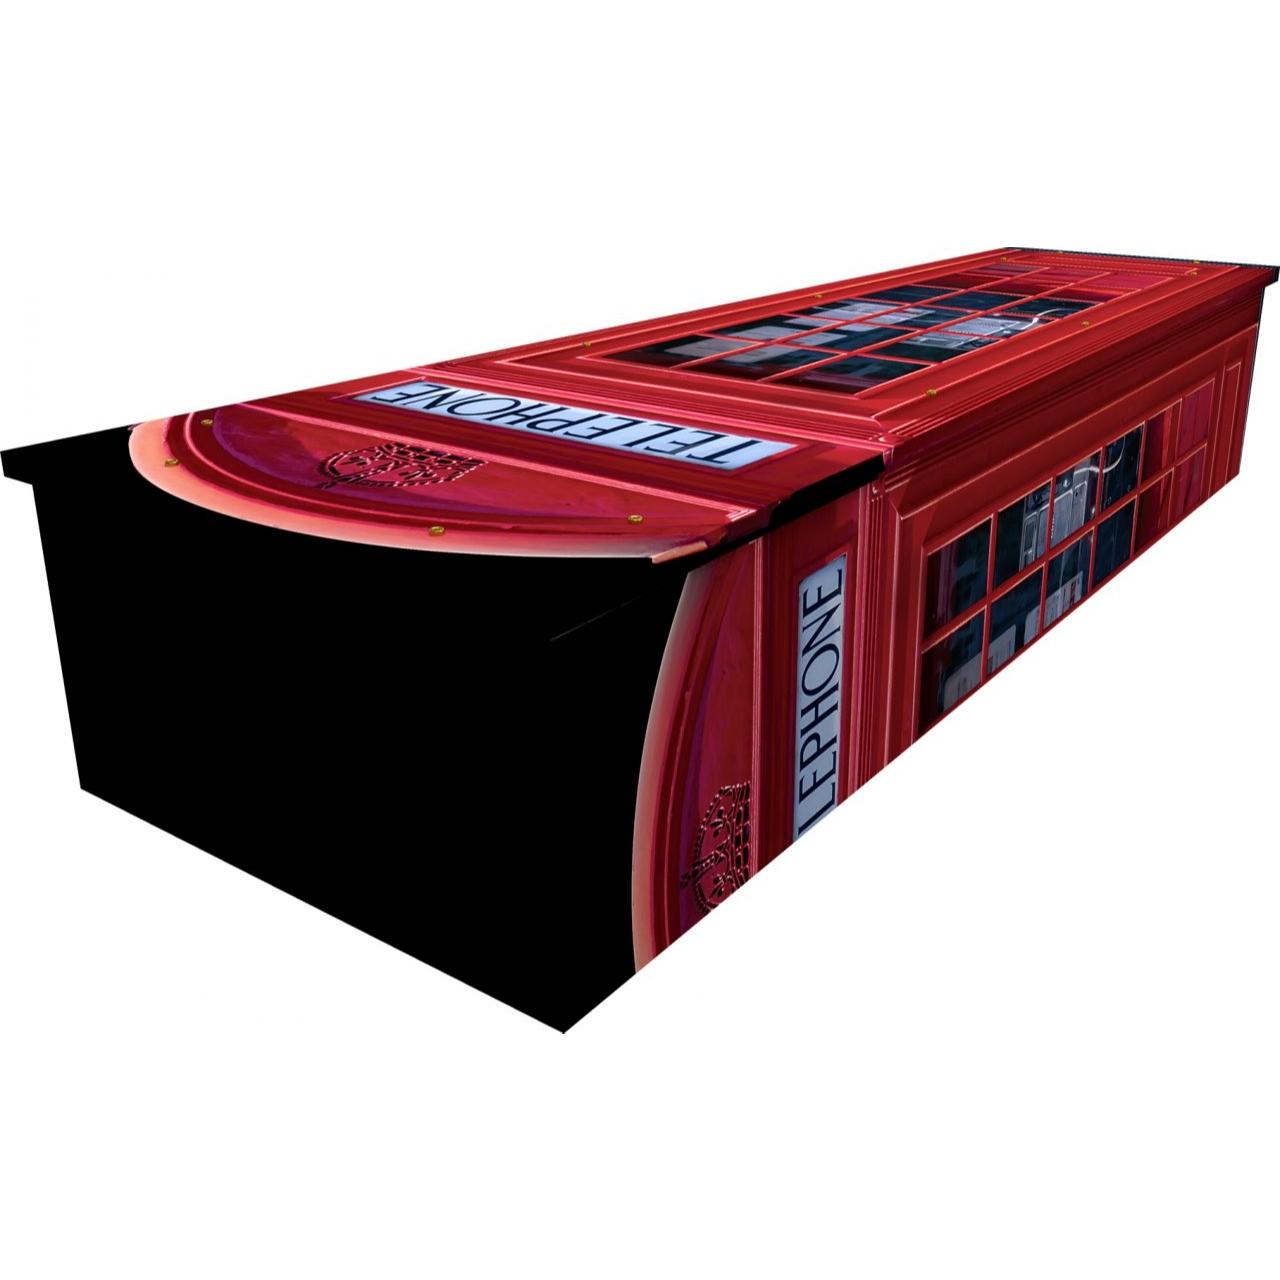 Phone Box Cardboard Coffin